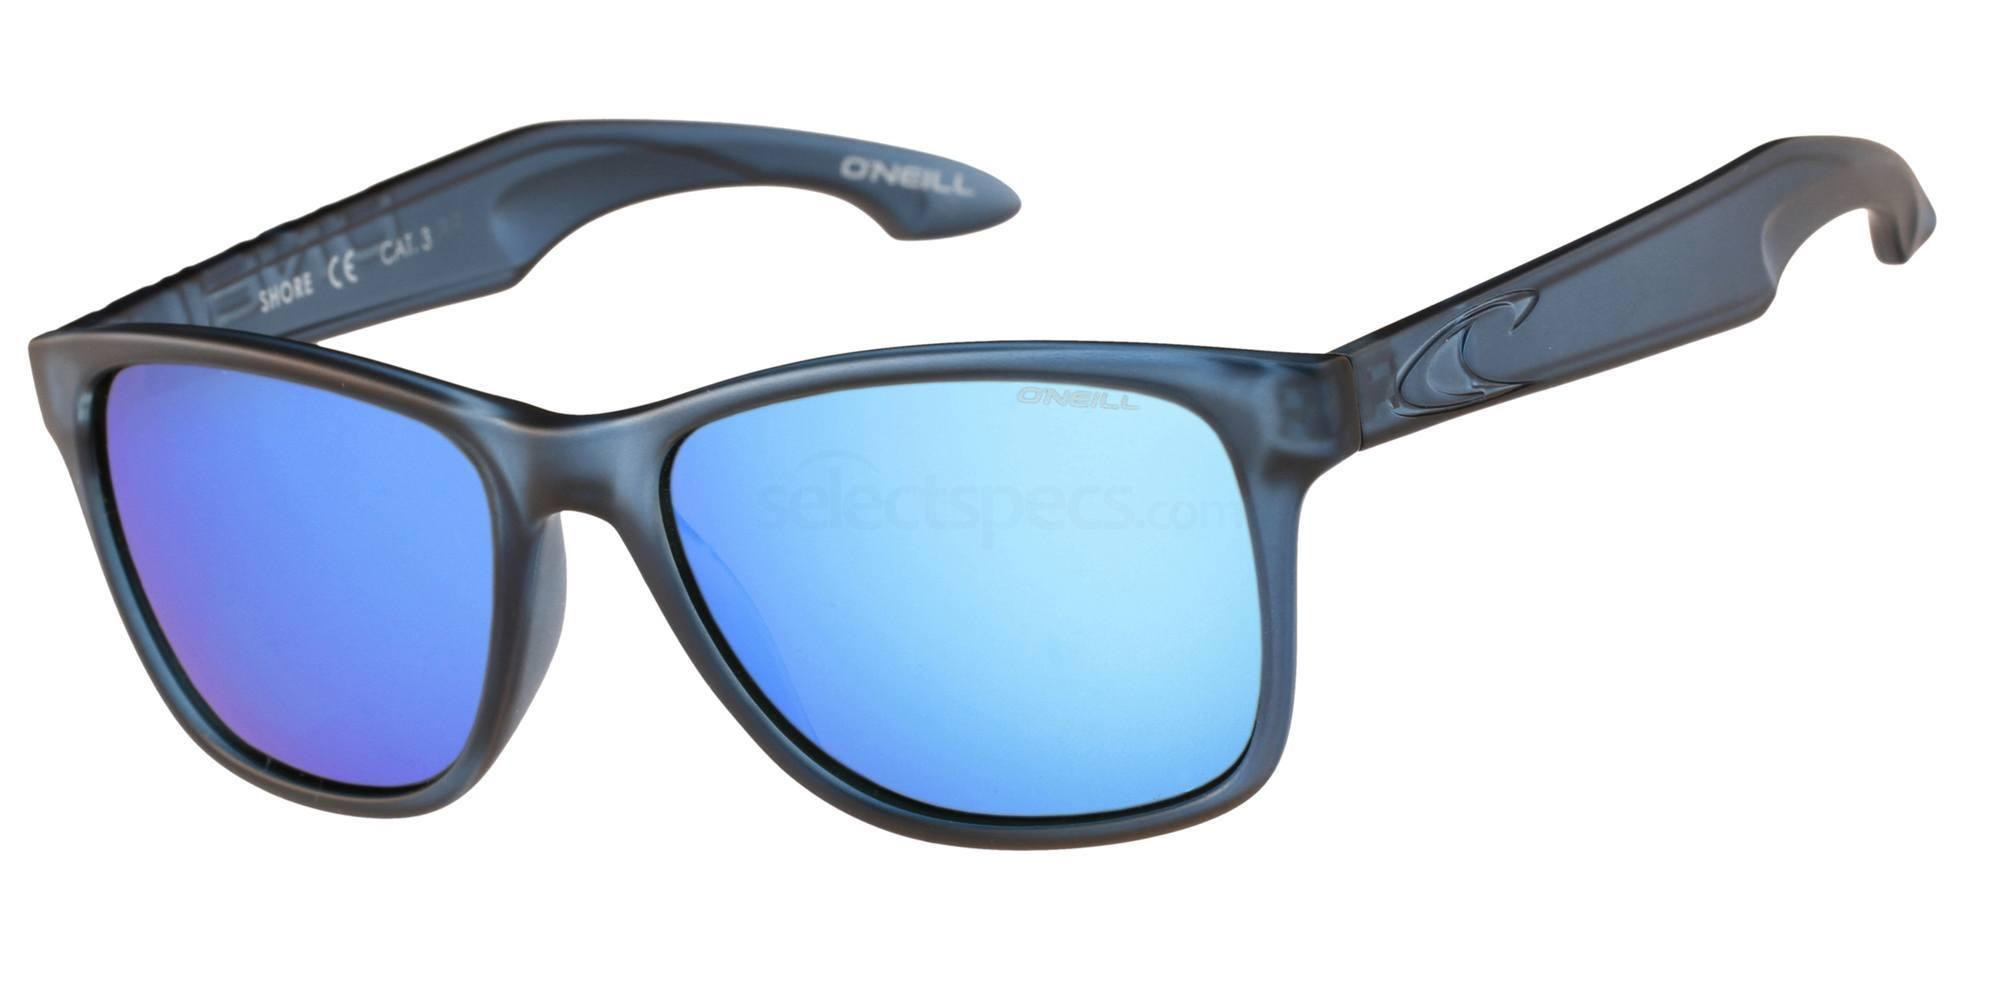 best polarised sunglasses for winter walks sports women oneill